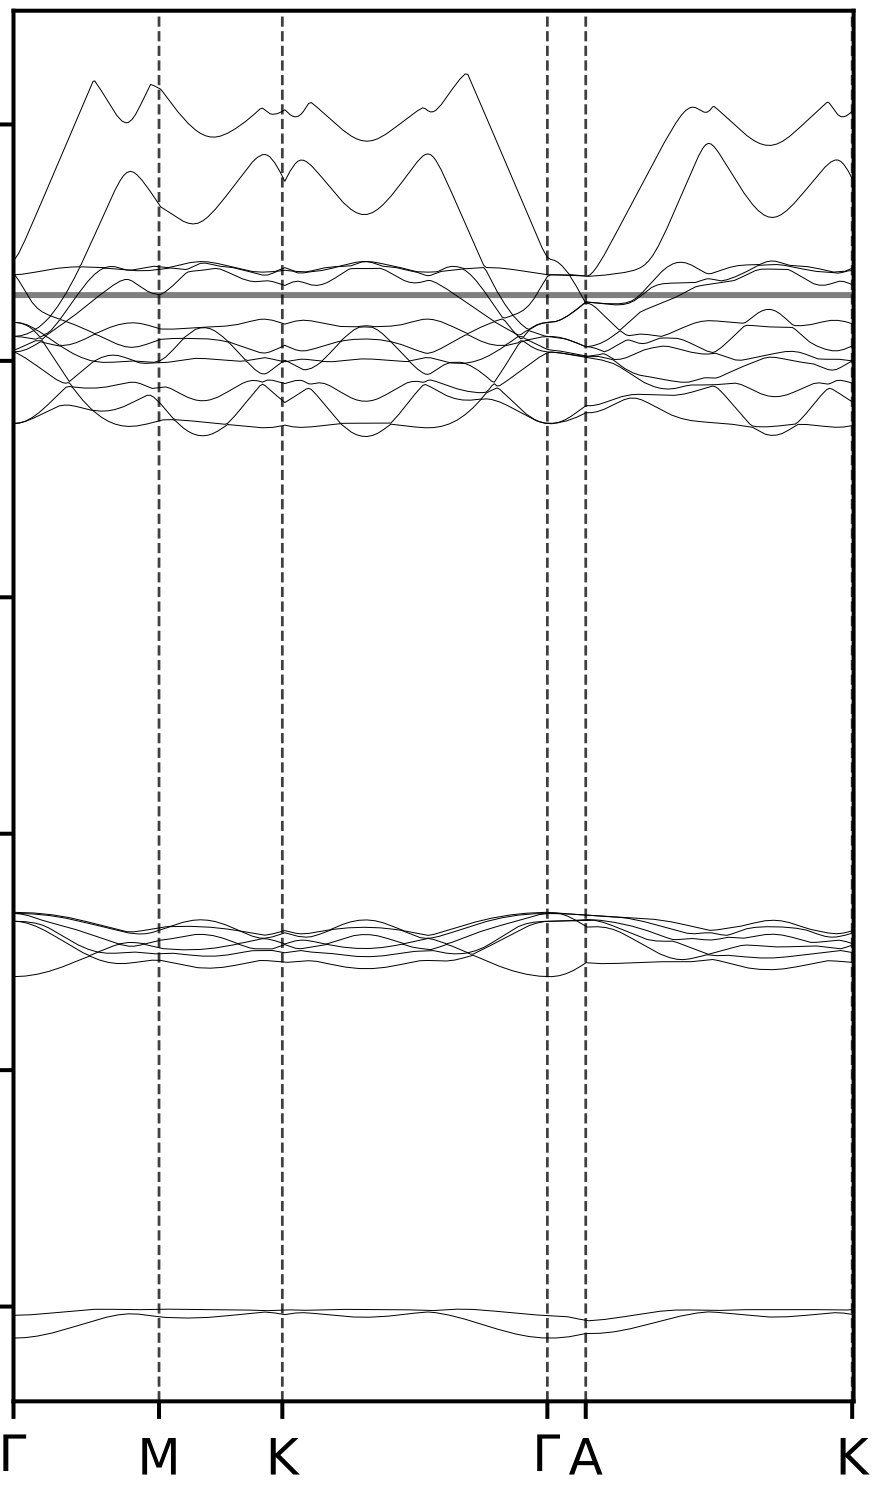 Band Diagram on Quantum ESPRESSO - Jingyi Zhuang | 庄婧怡